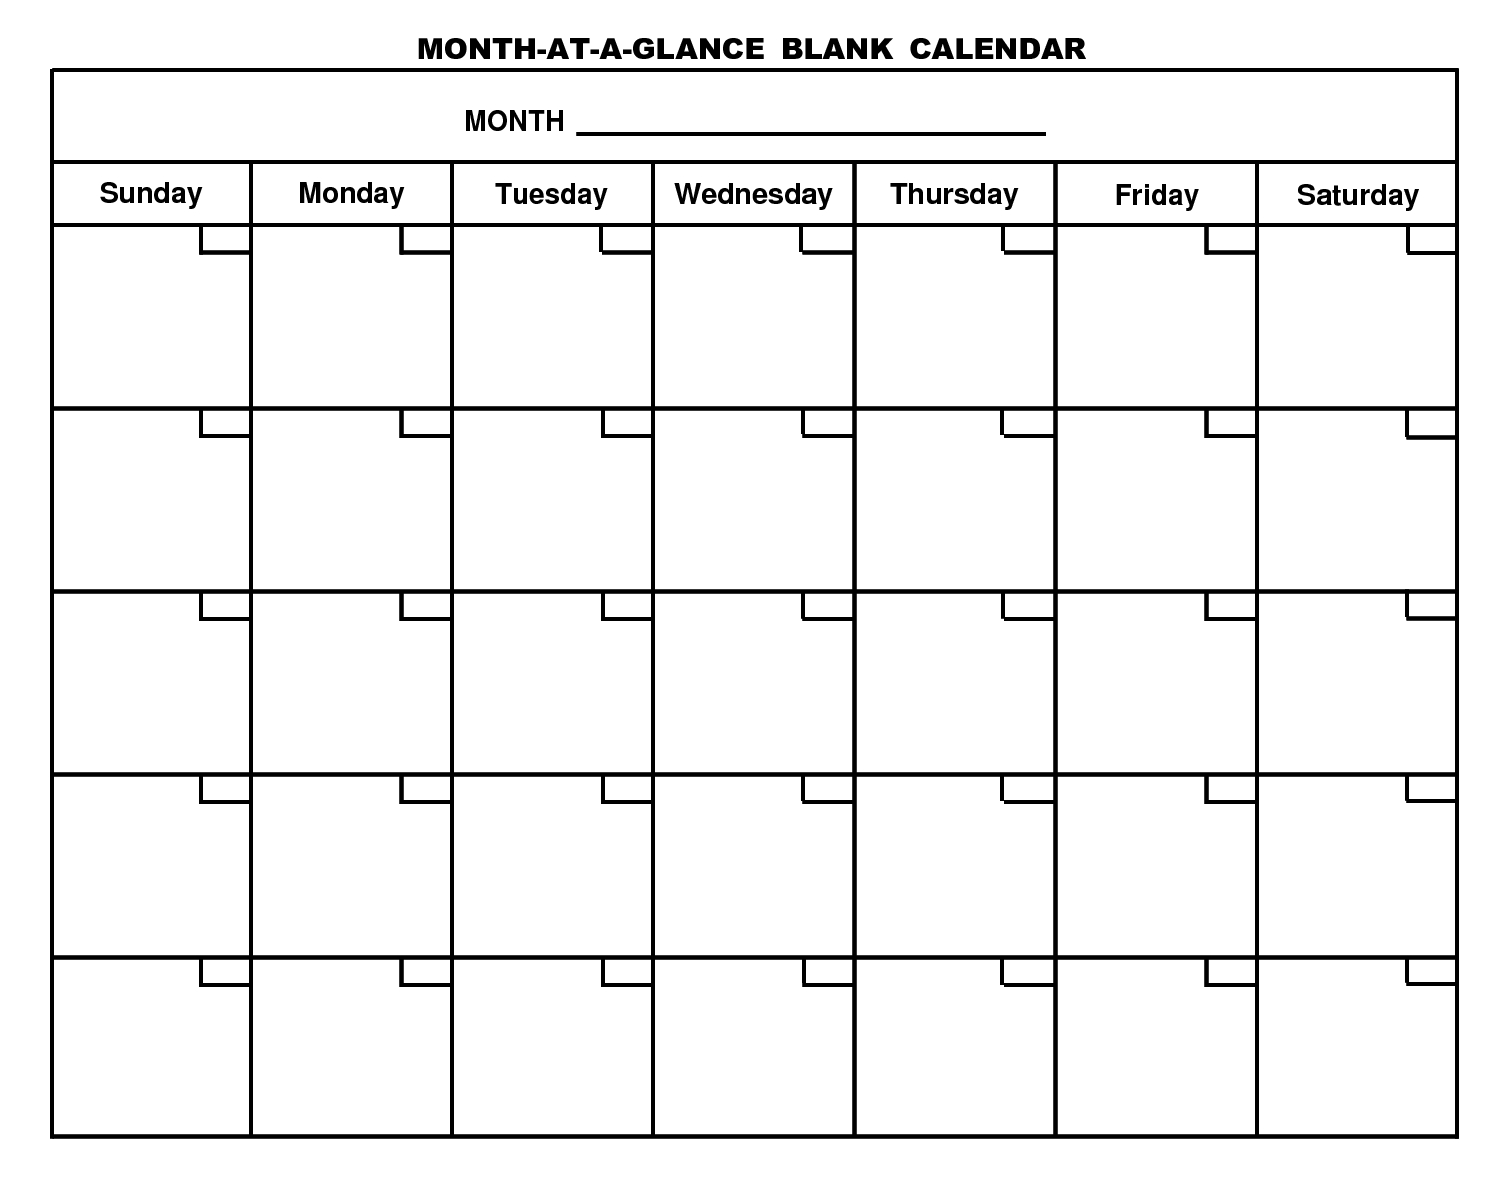 Catch Blank Calendar To Fill In